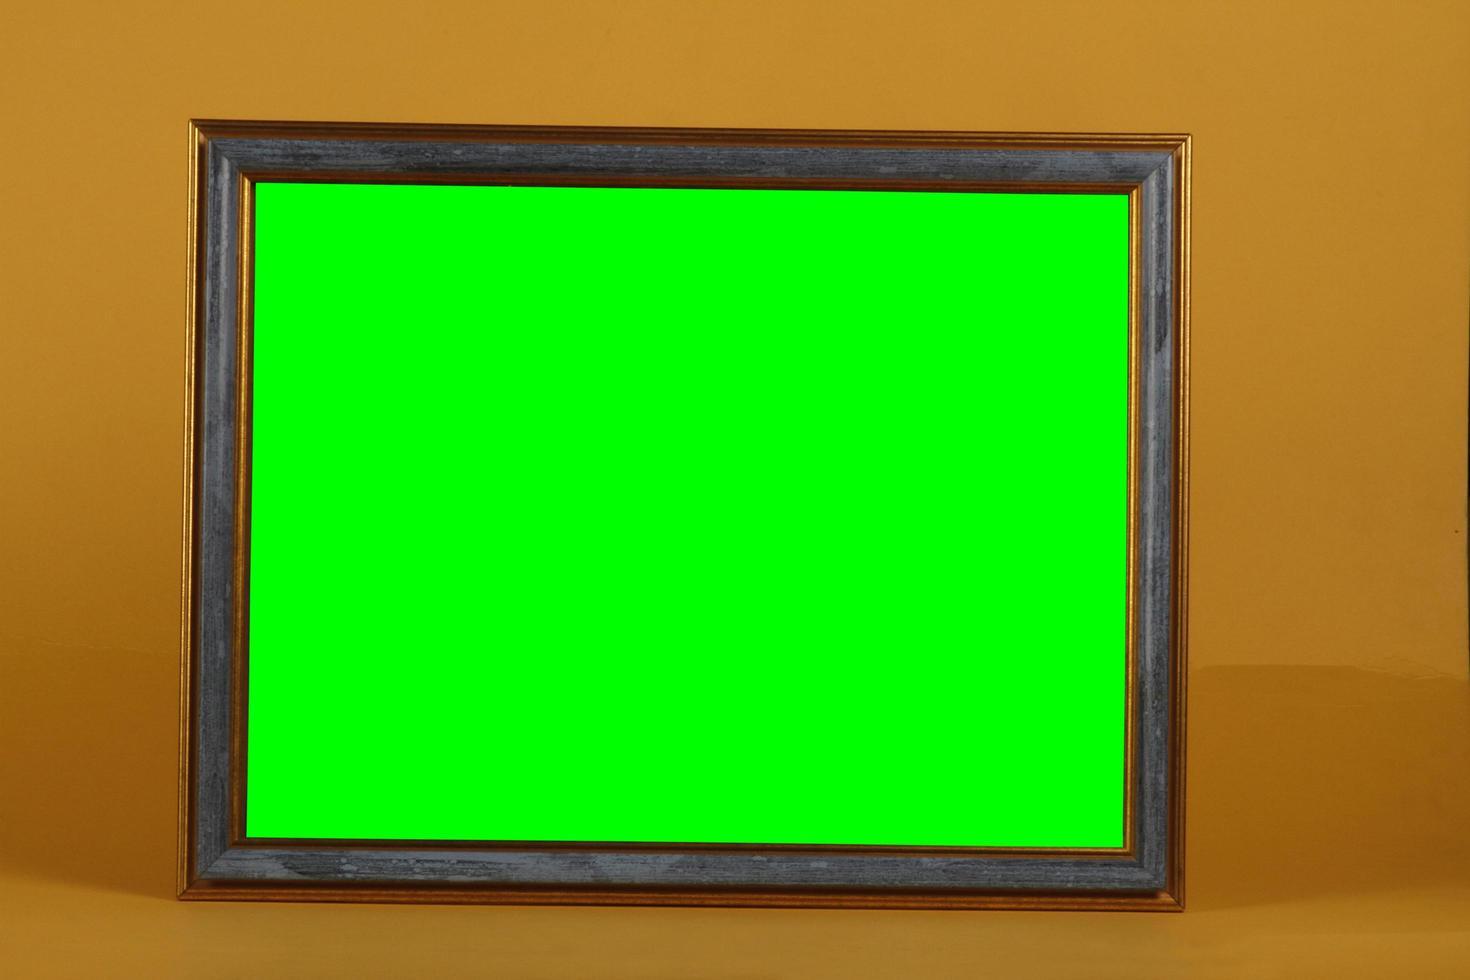 marco vacío de madera o material artificial. foto